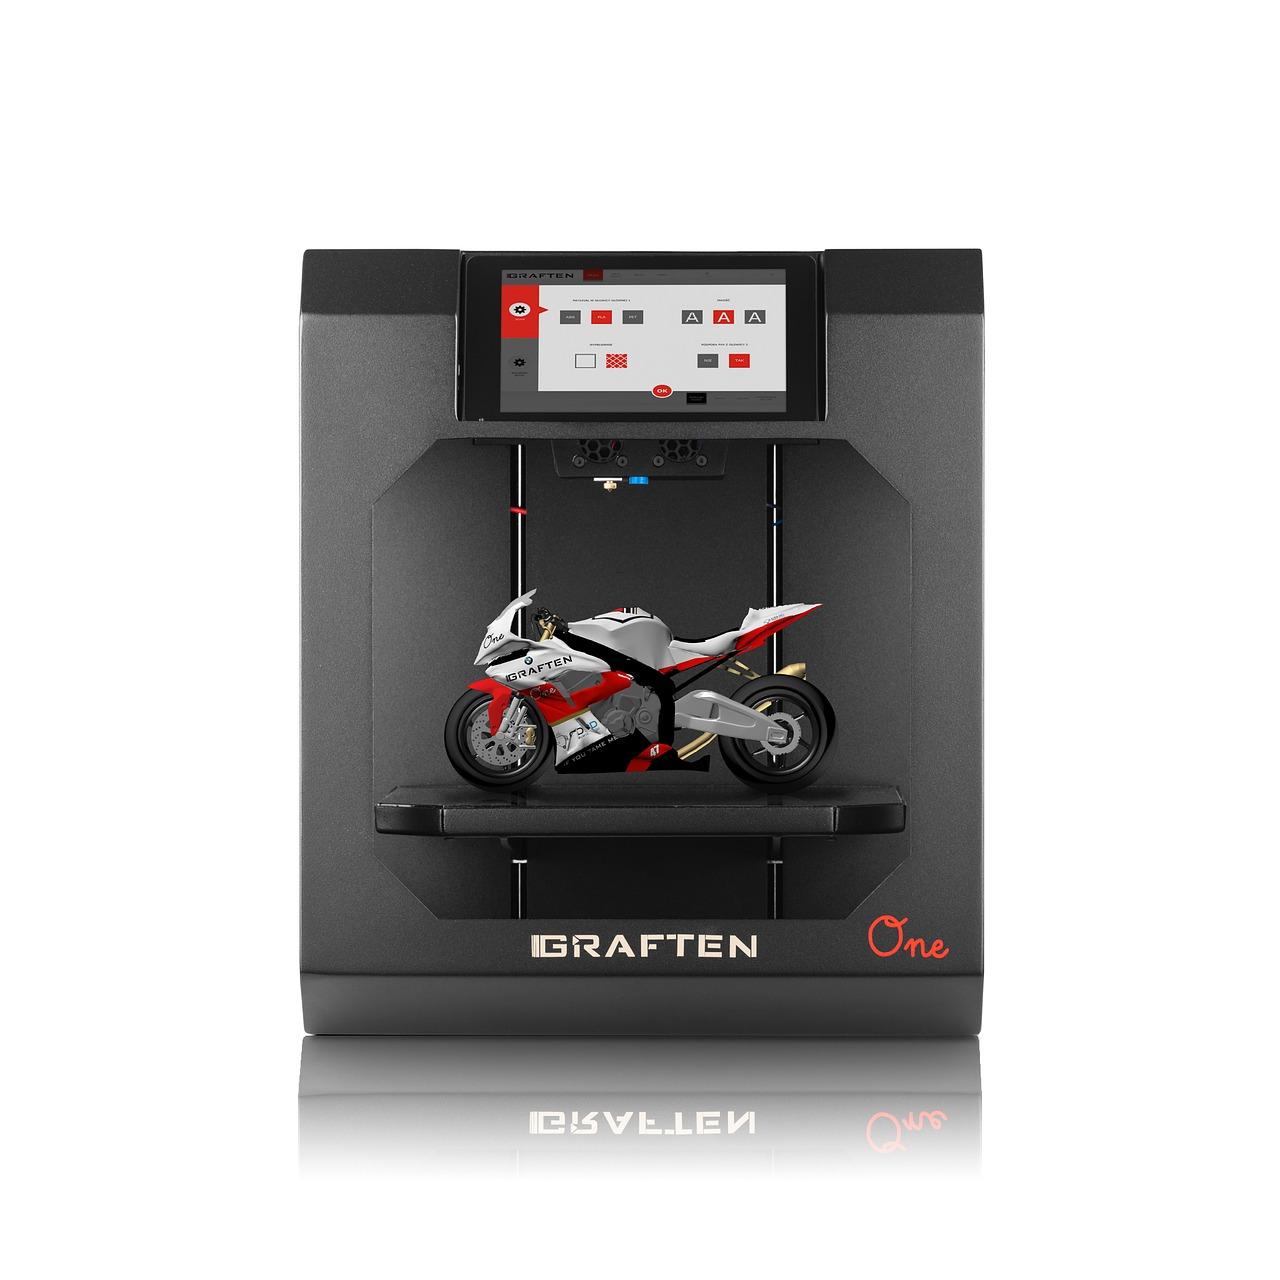 Monoprice 115365 Select Mini 3d Printer Black Friday 2019 Cyber